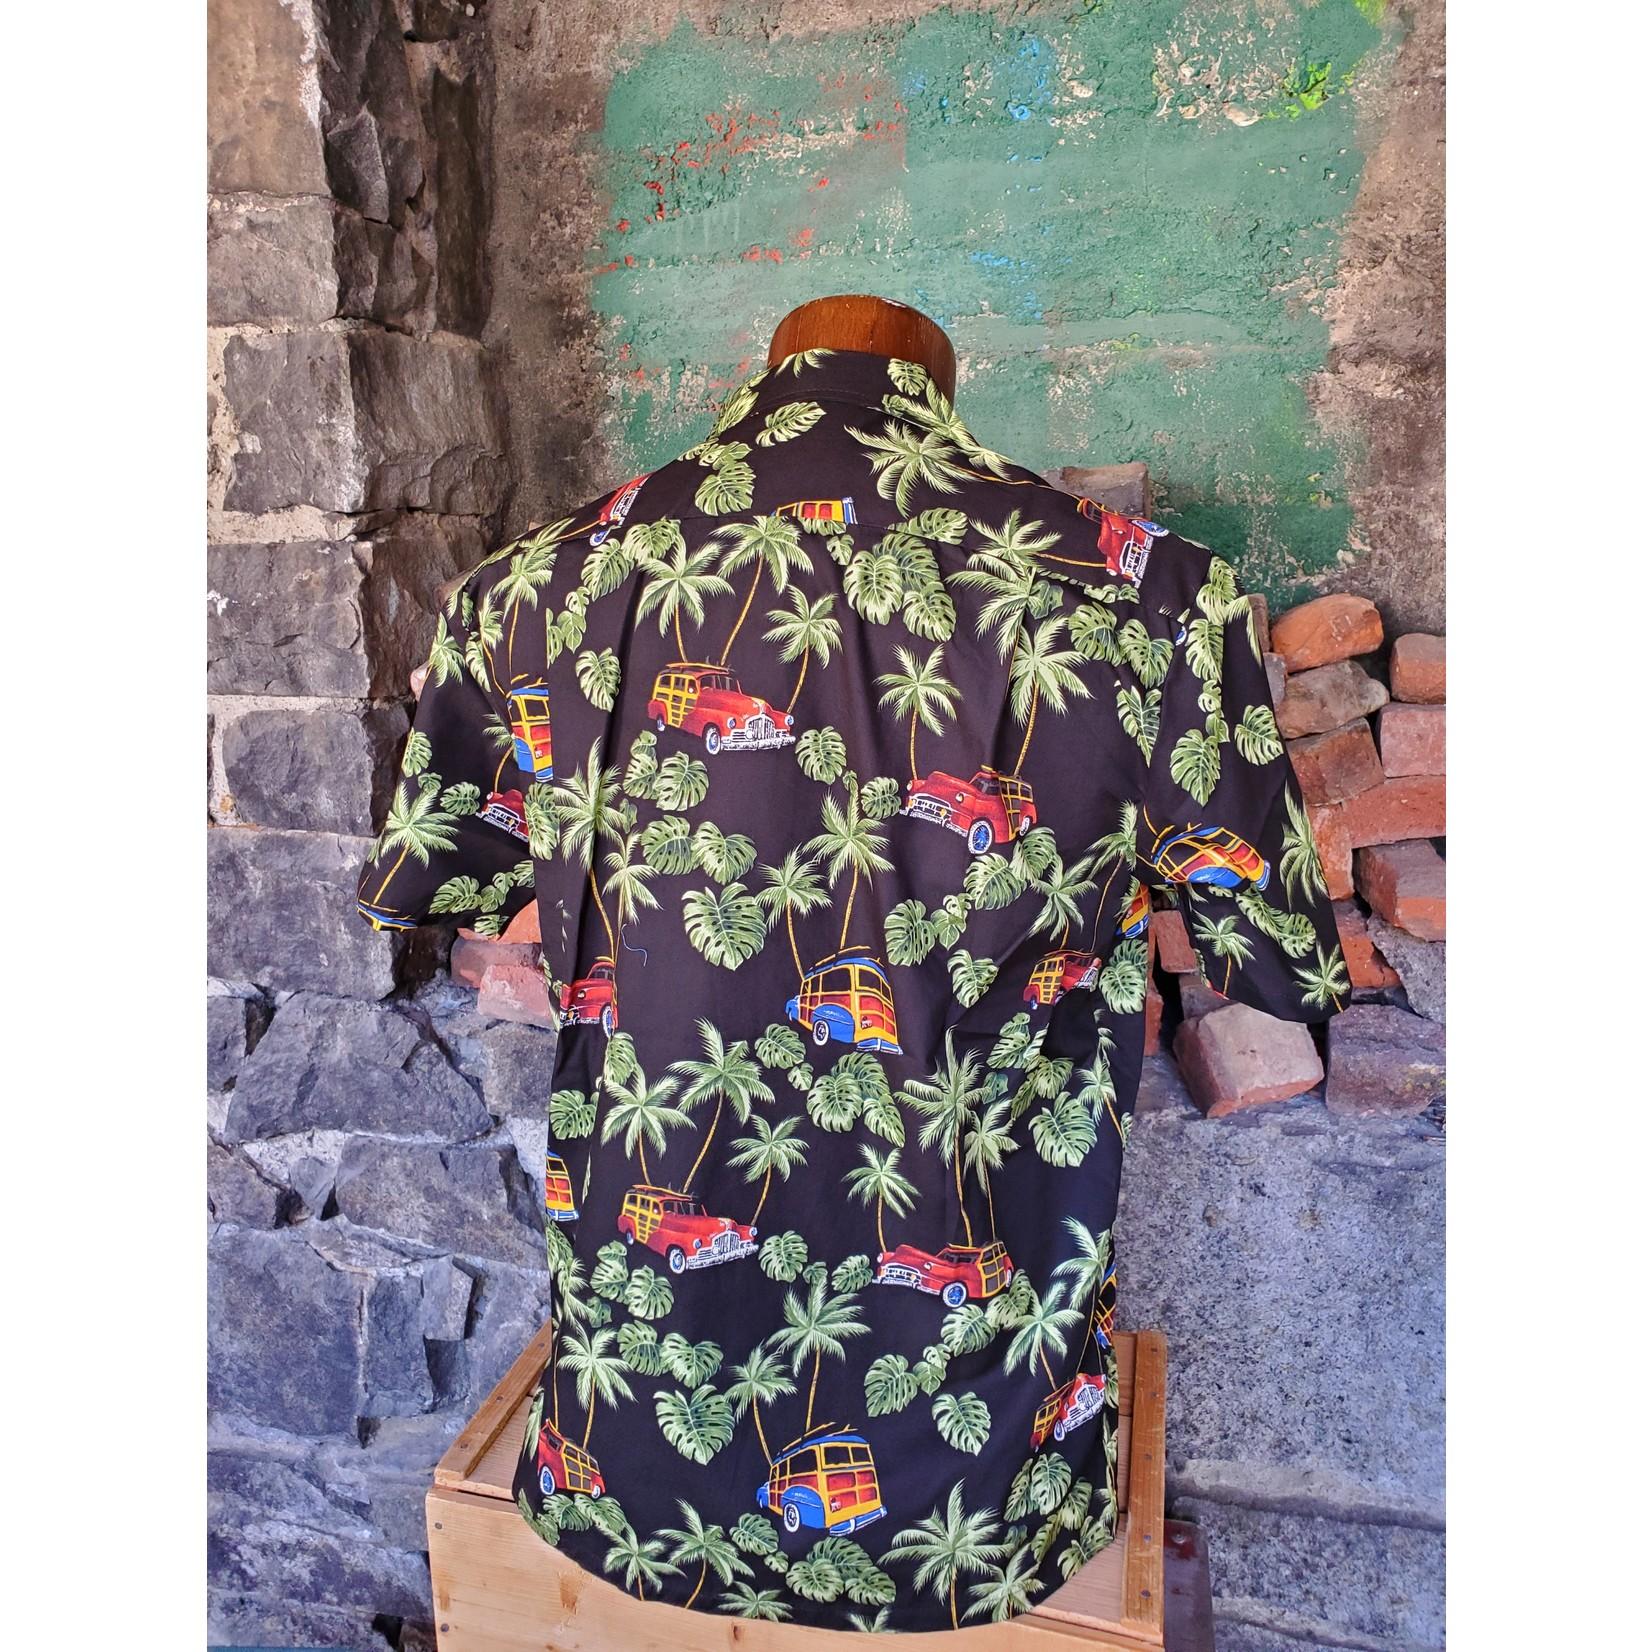 RJC Authentic Hawaiian Shirt - Vintage Cars